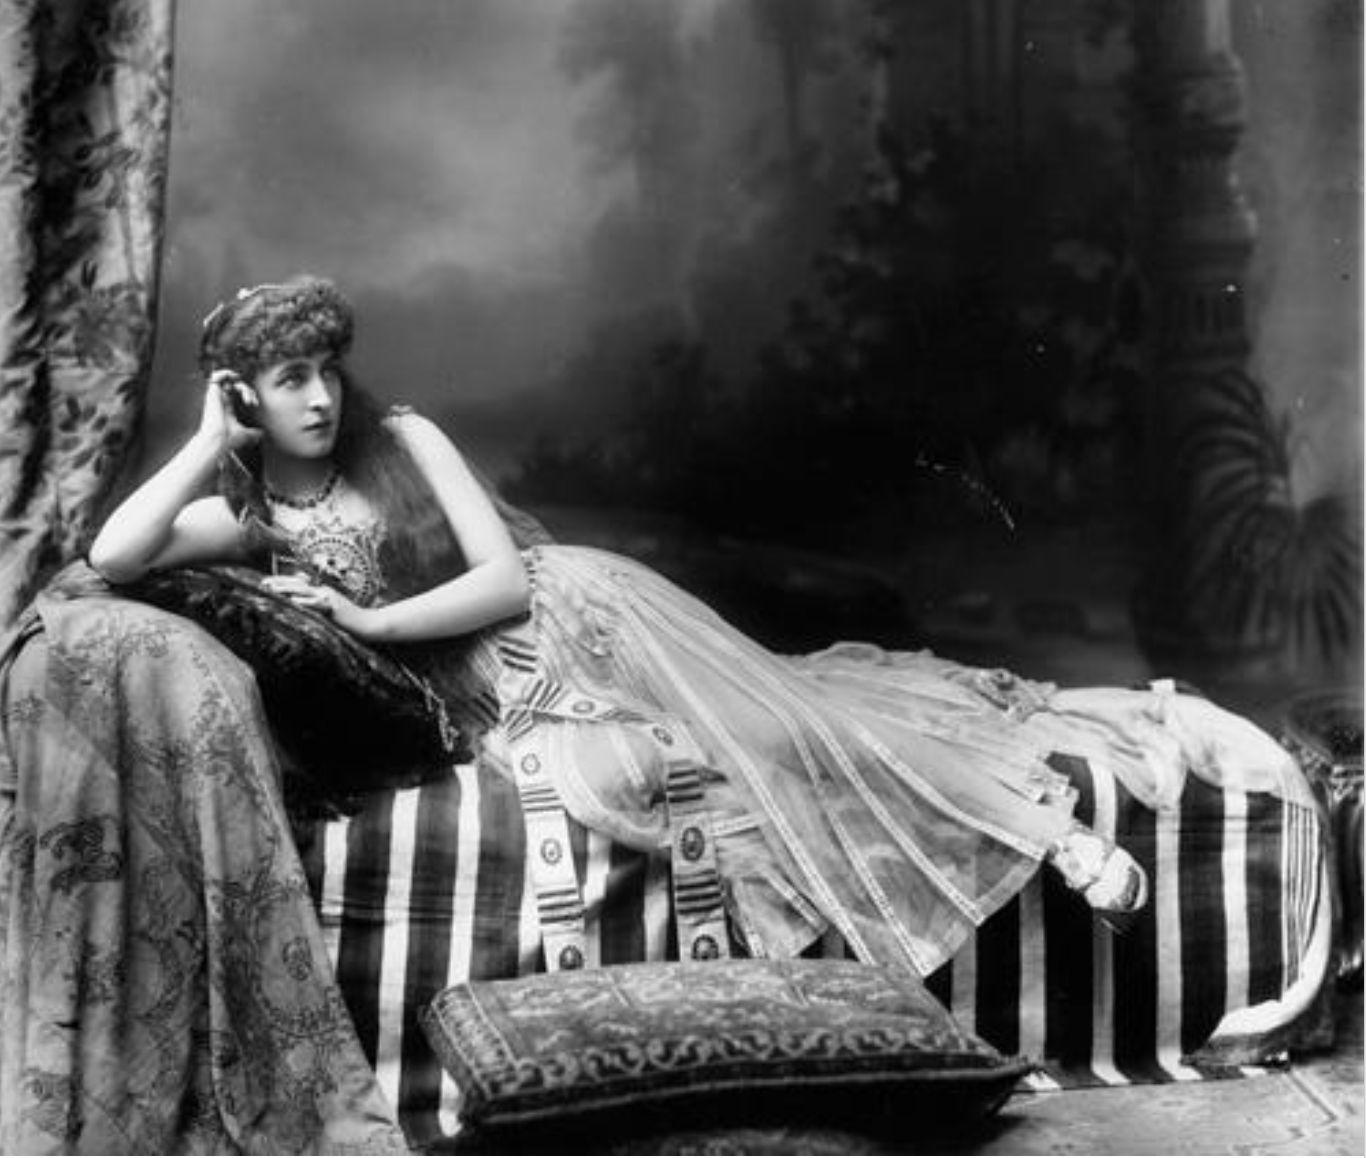 Famous Actress Lili Langtry was regular Rayne customer